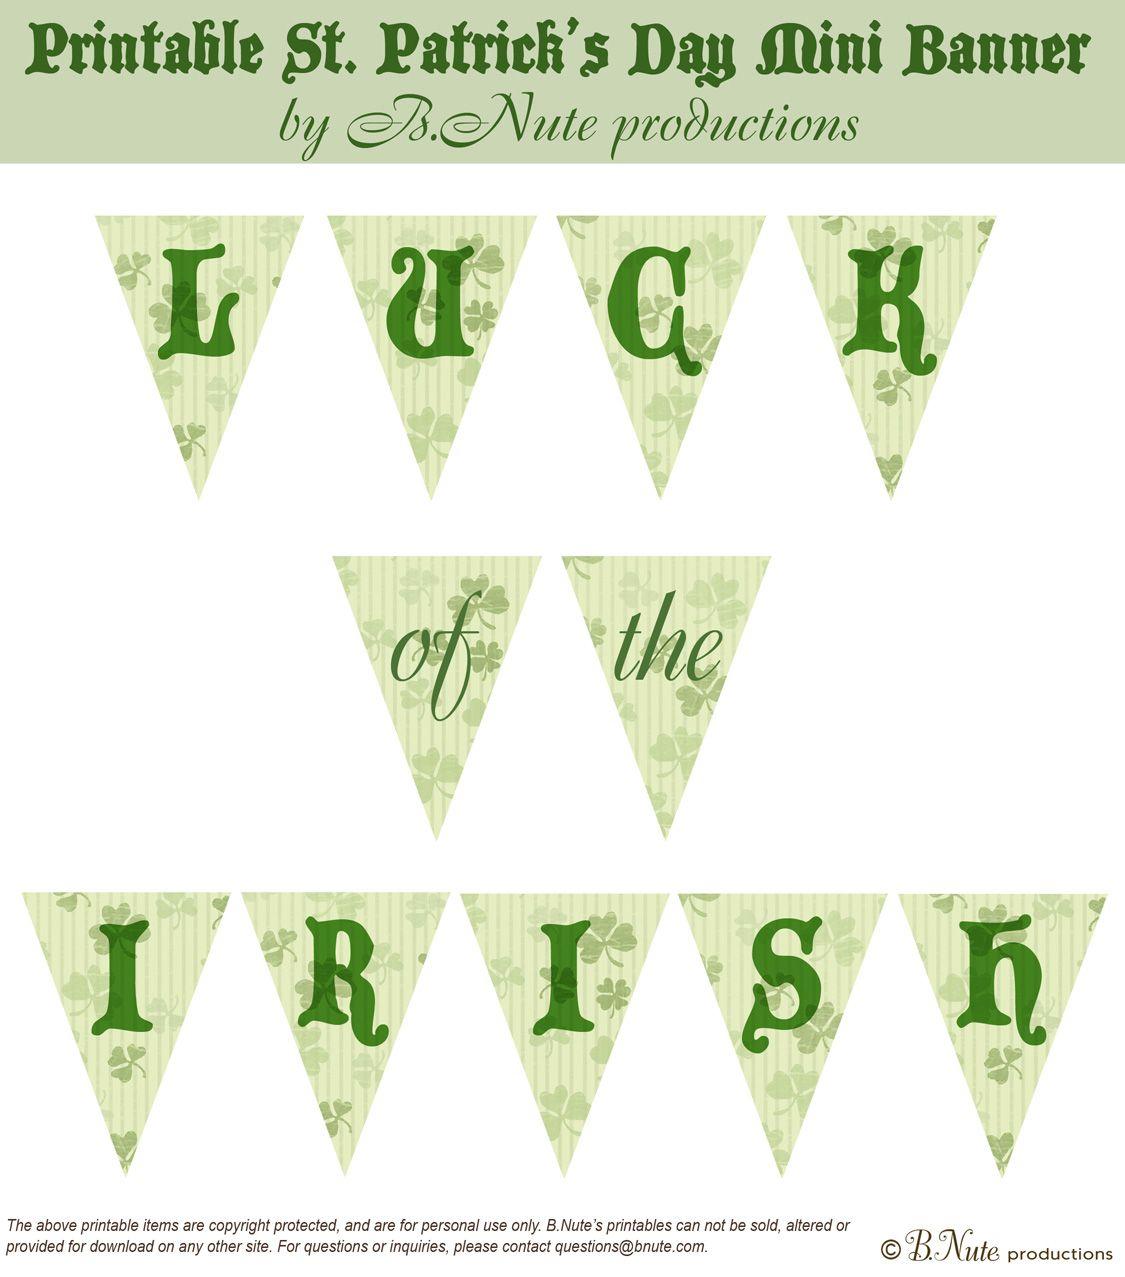 Free Printable Luck Of The Irish St. Patrick's Day Mini Bannerb - Free Printable St Patrick's Day Banner